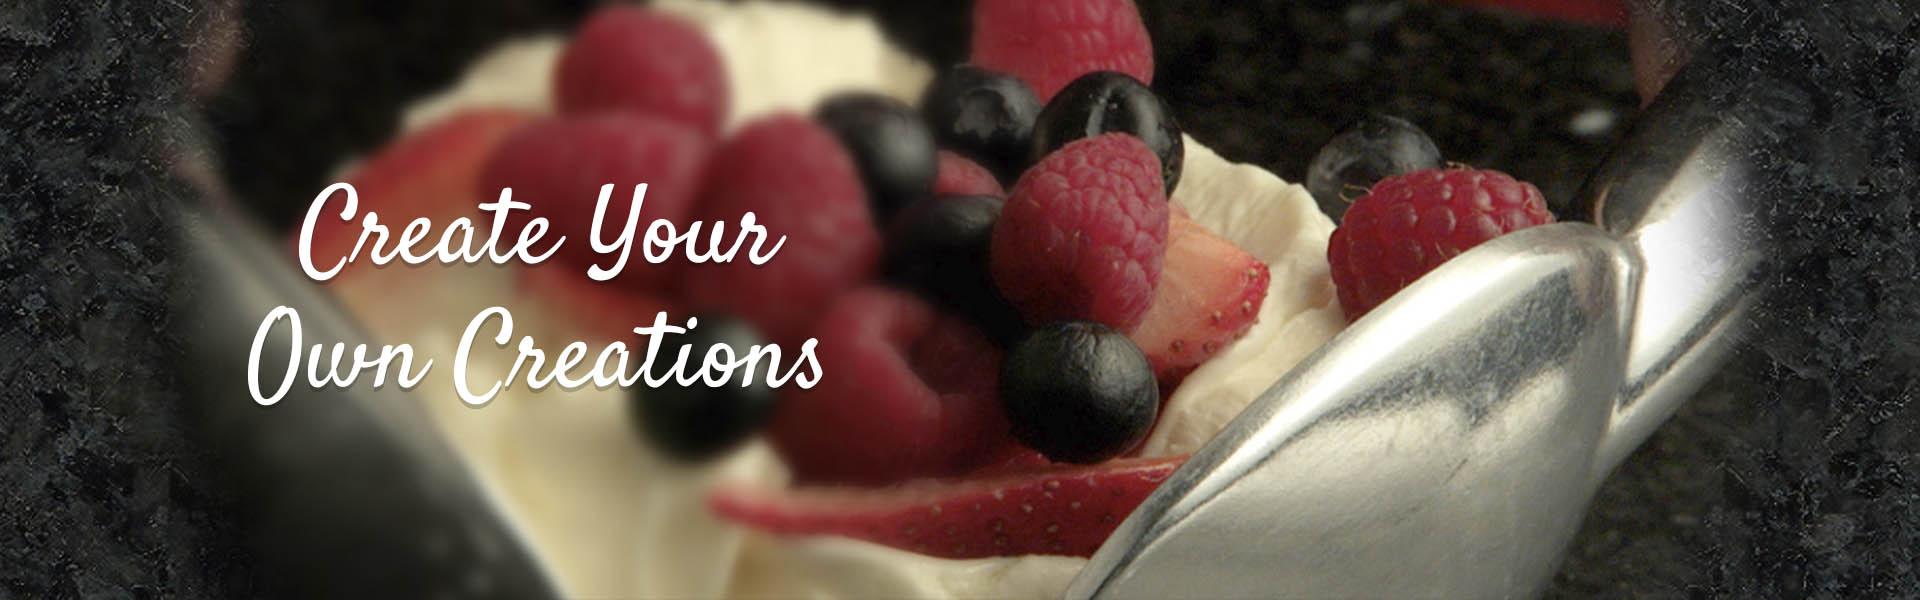 Ice Cream - Create Your Own